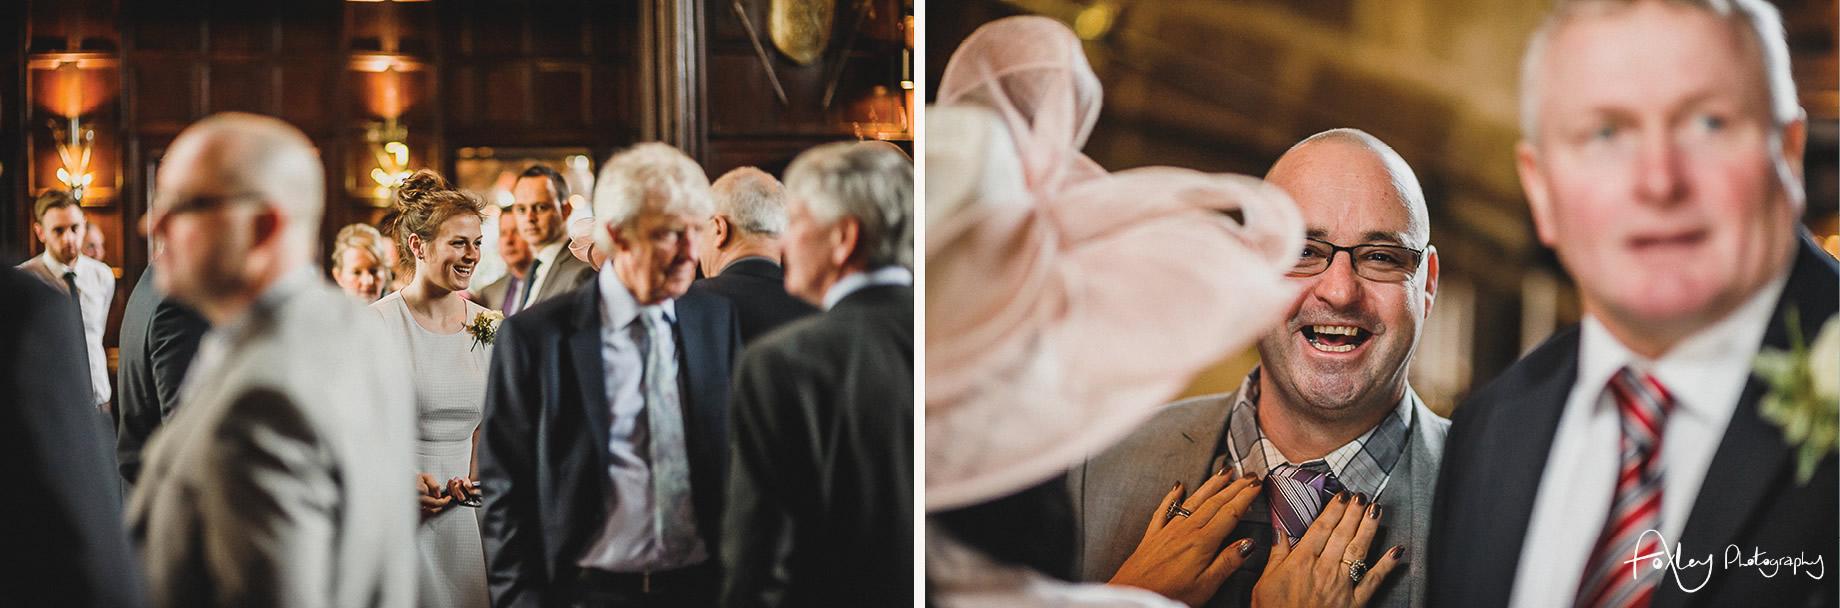 Gemma and Lewis' Wedding at Mitton Hall 060